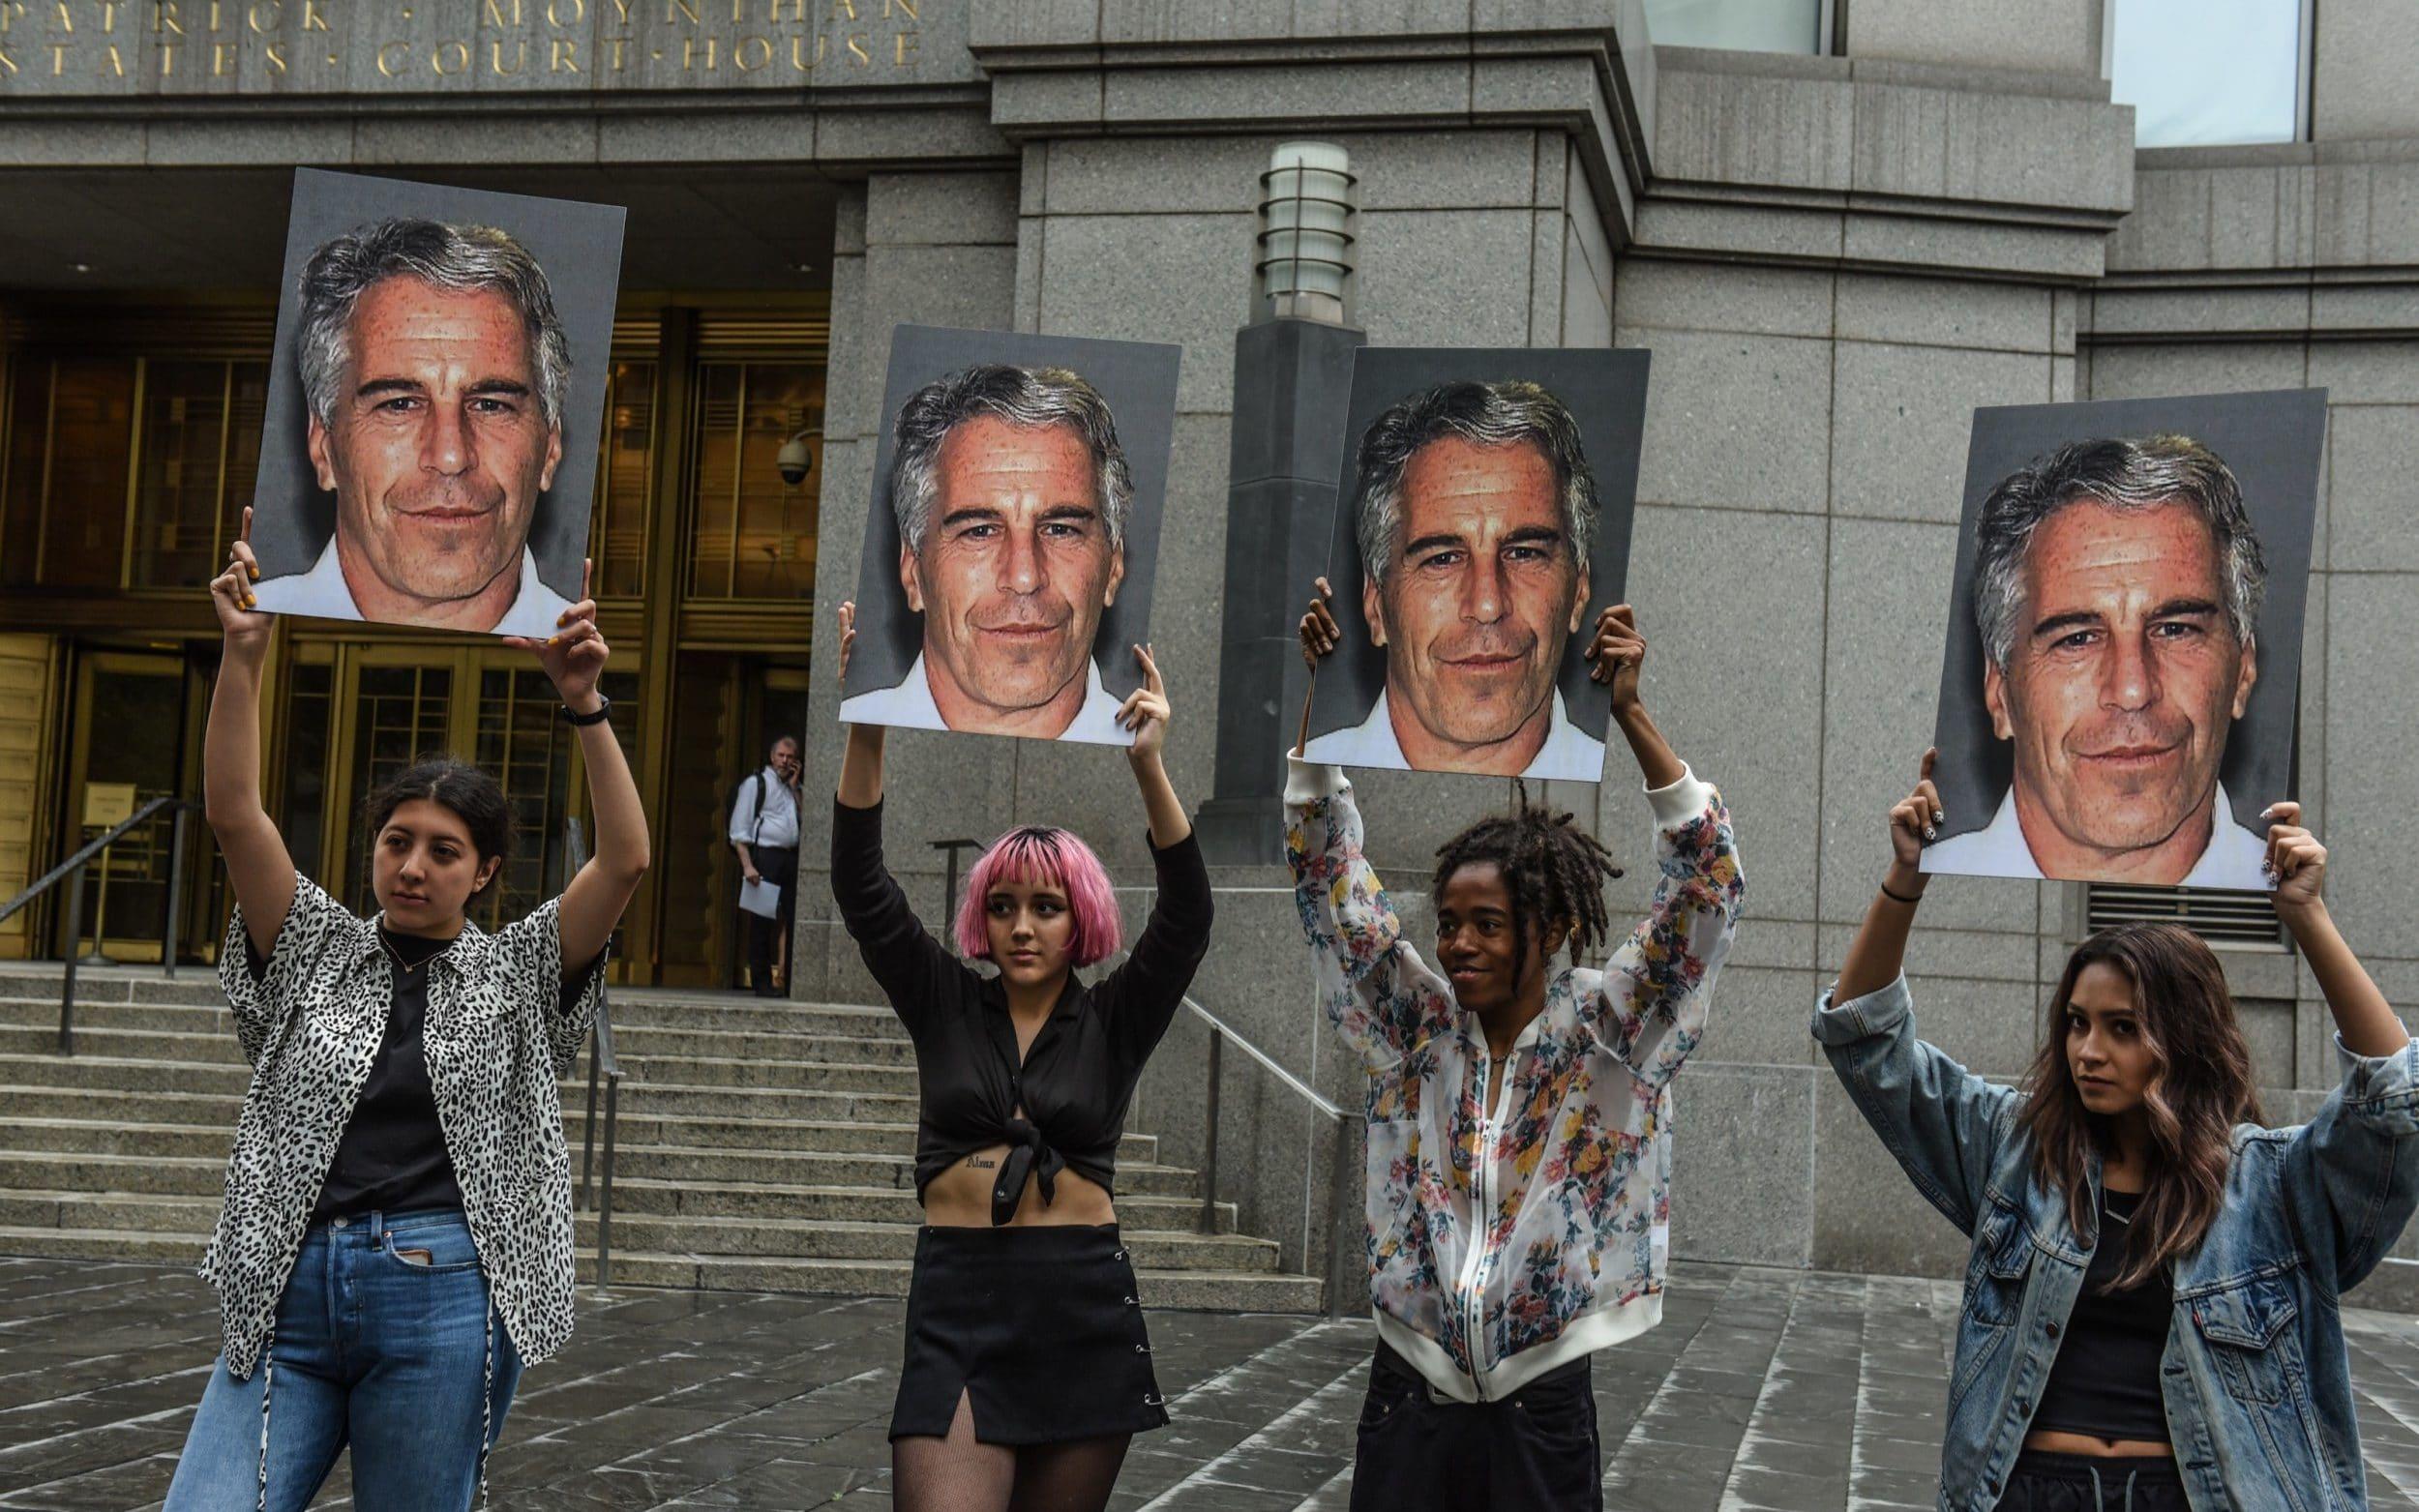 Billionaire financier Jeffrey Epstein pleads not guilty to sex trafficking charges